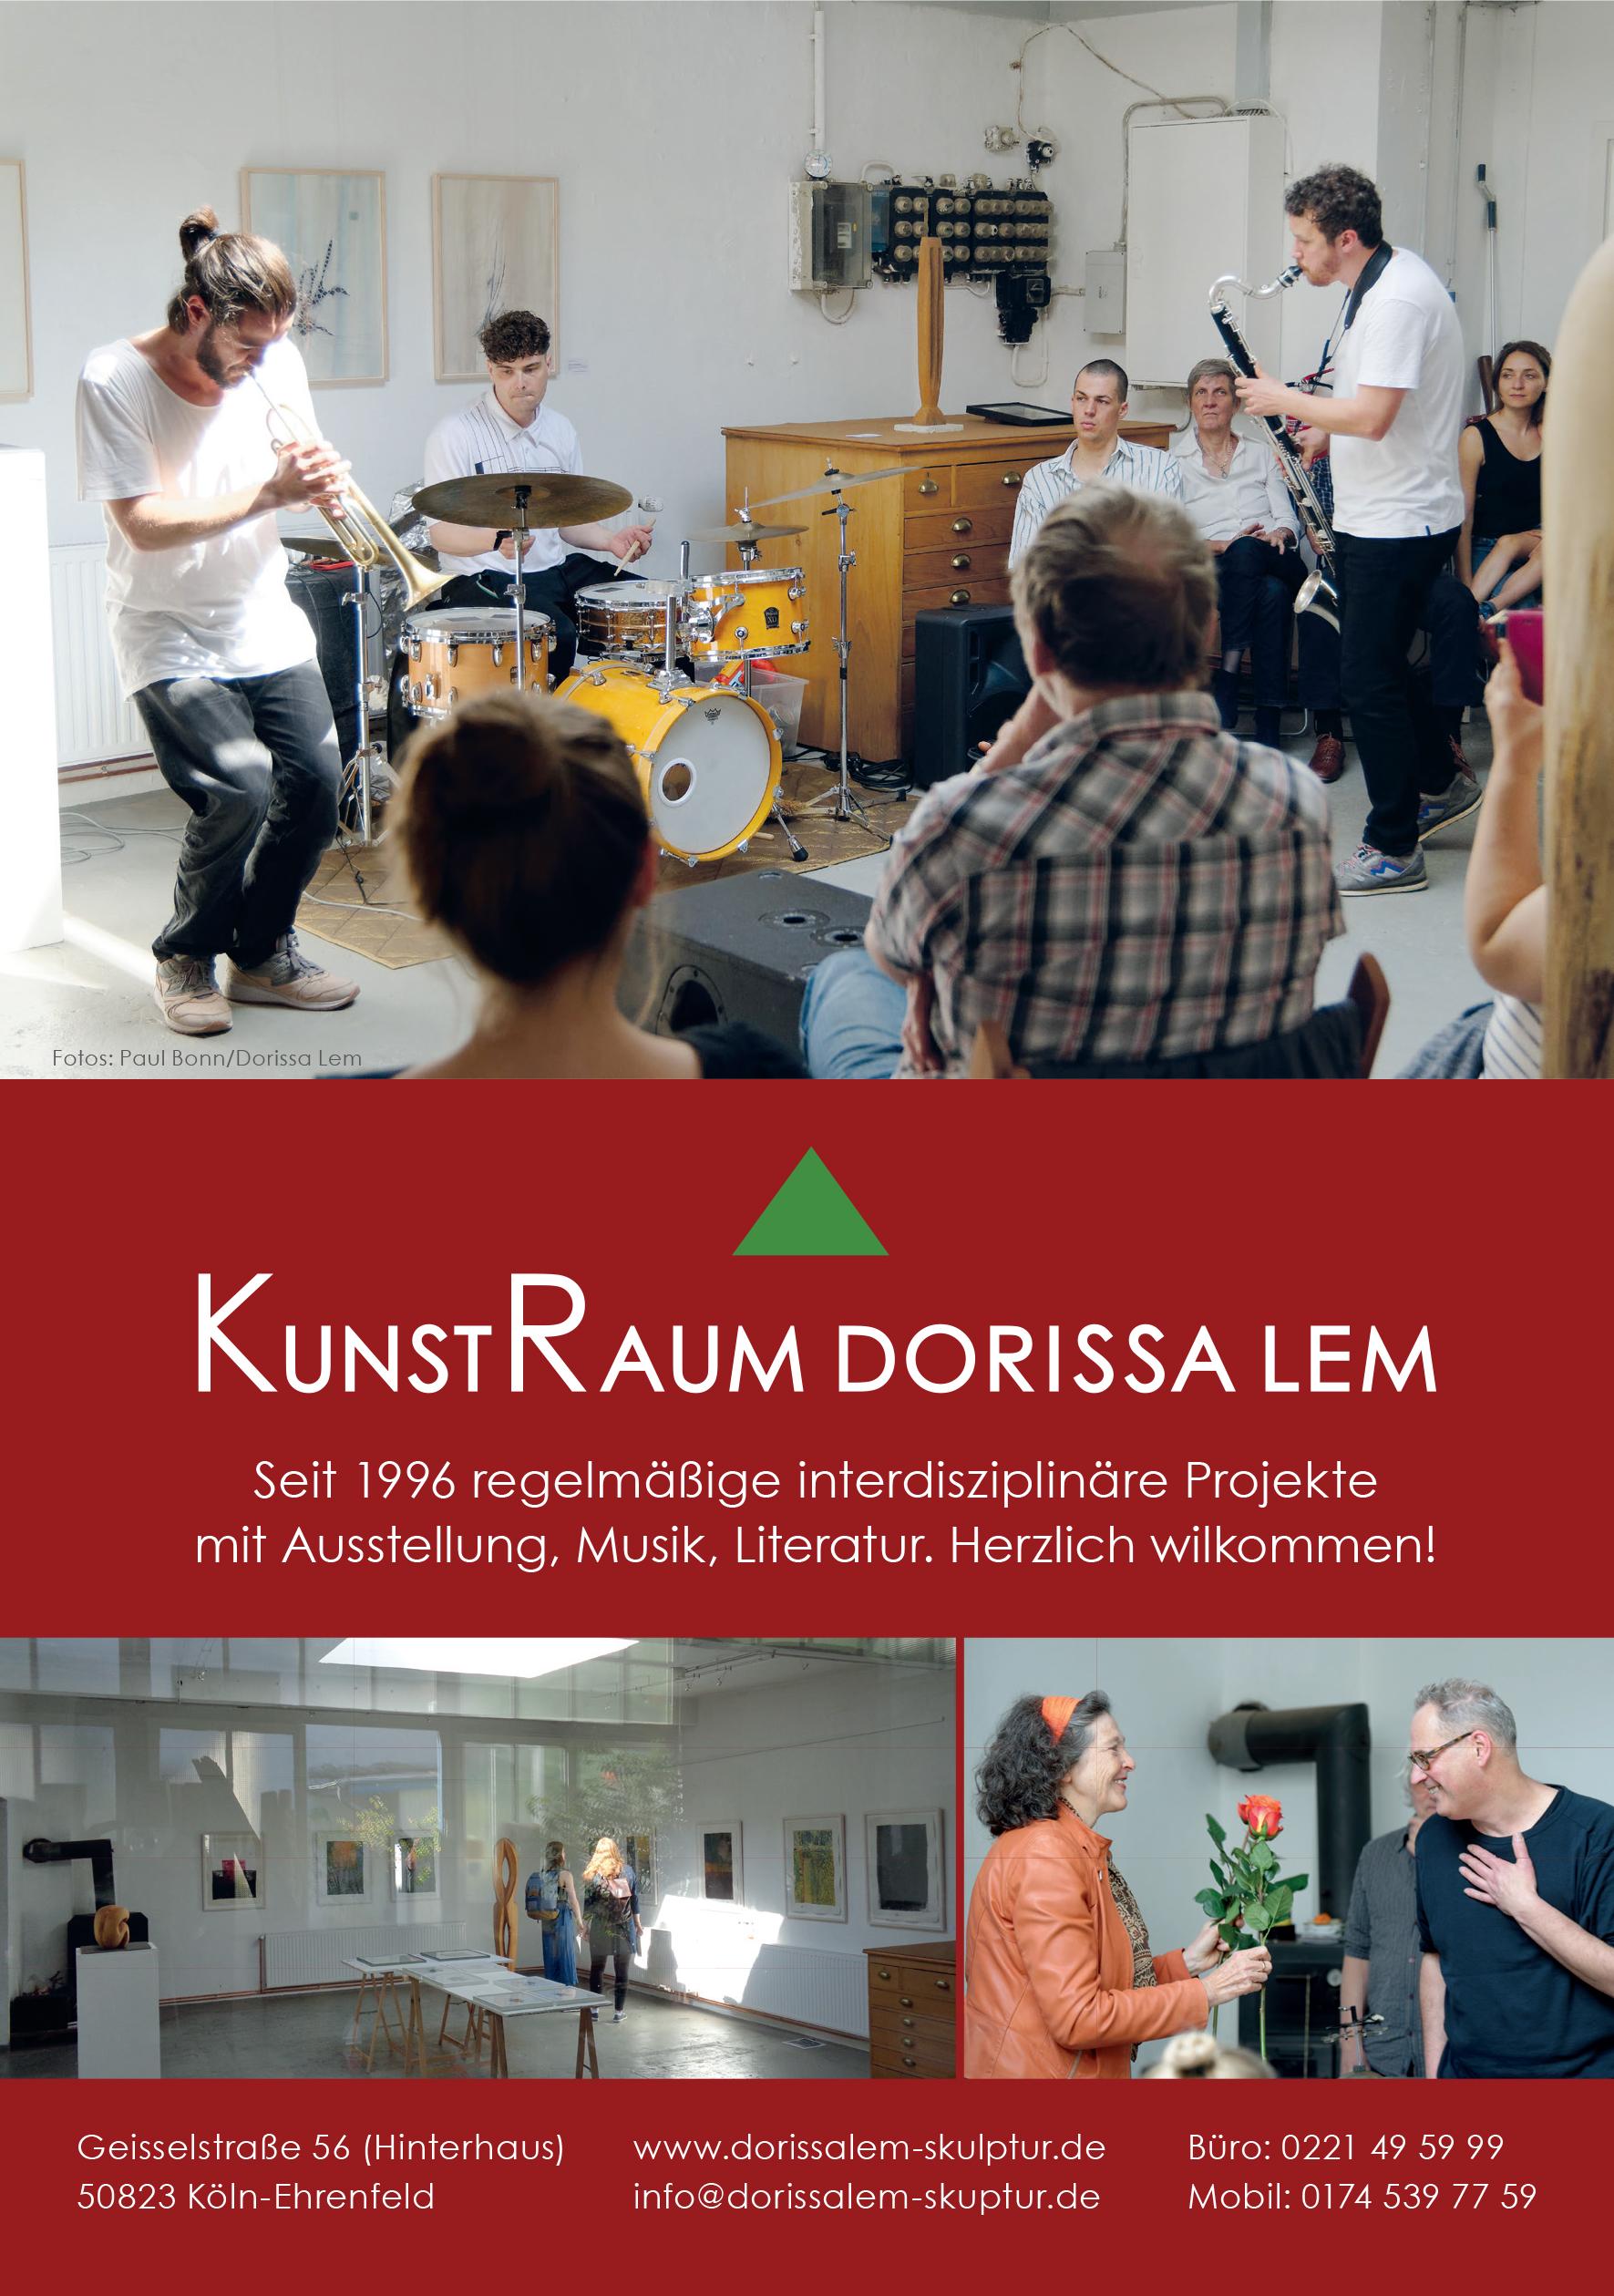 Kunstroute-20_Dorissa-Lem_ew01.indd